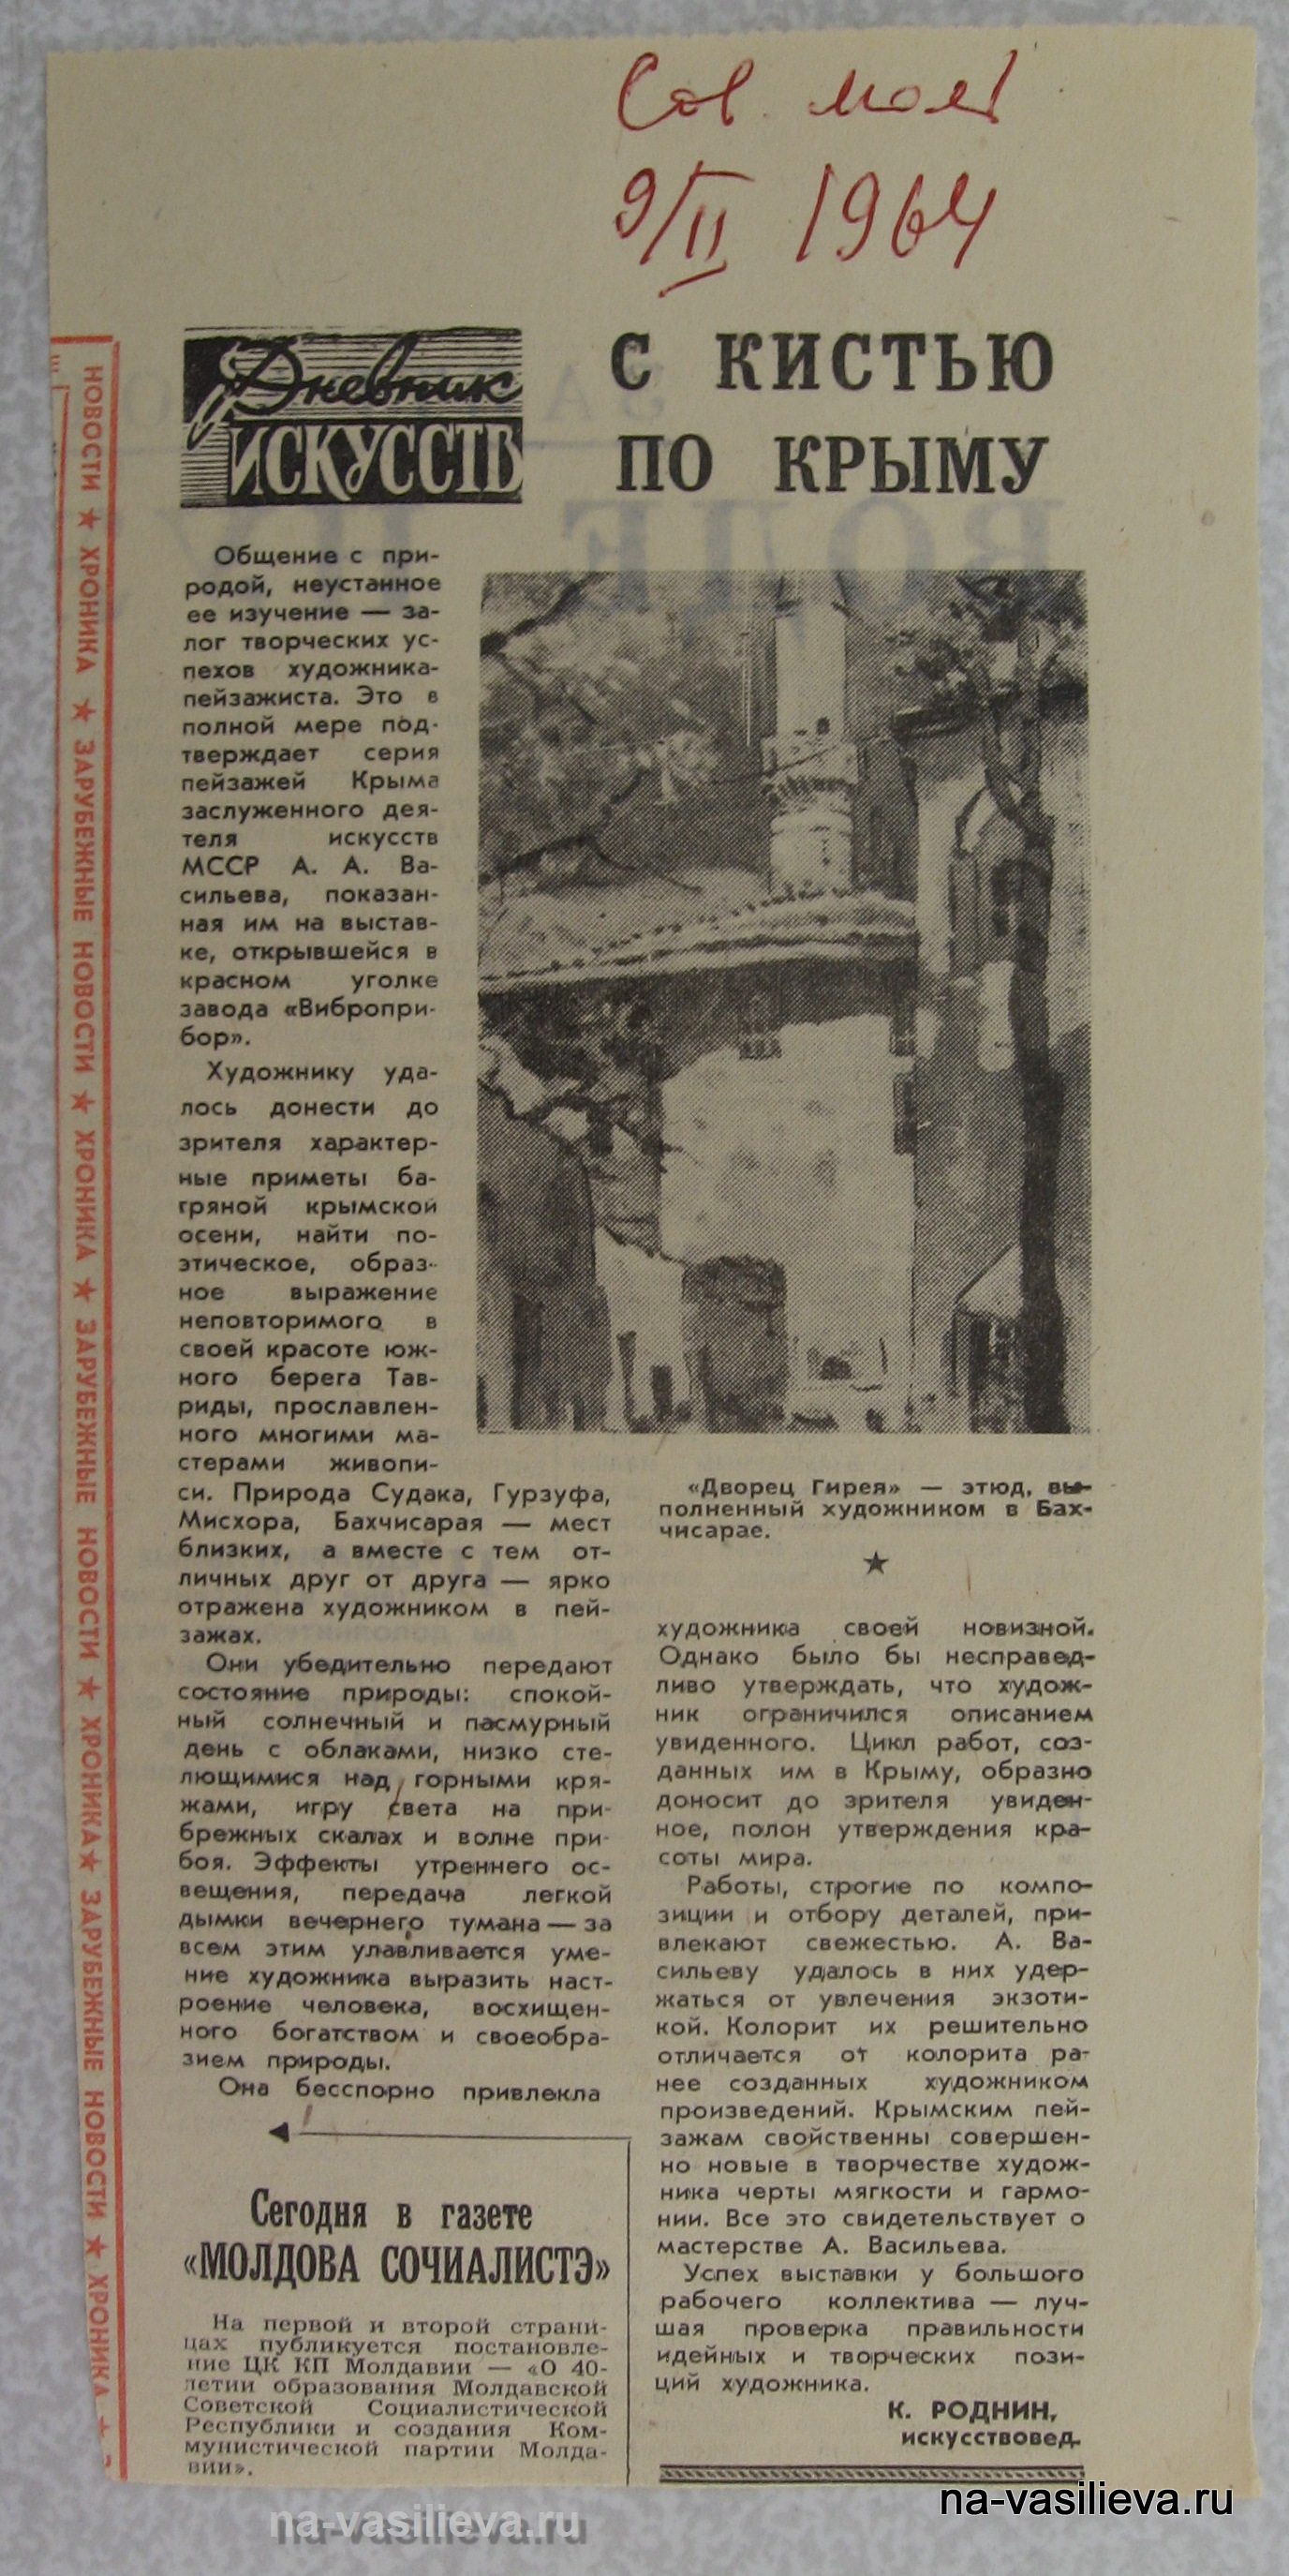 Васильев Роднин статья 1